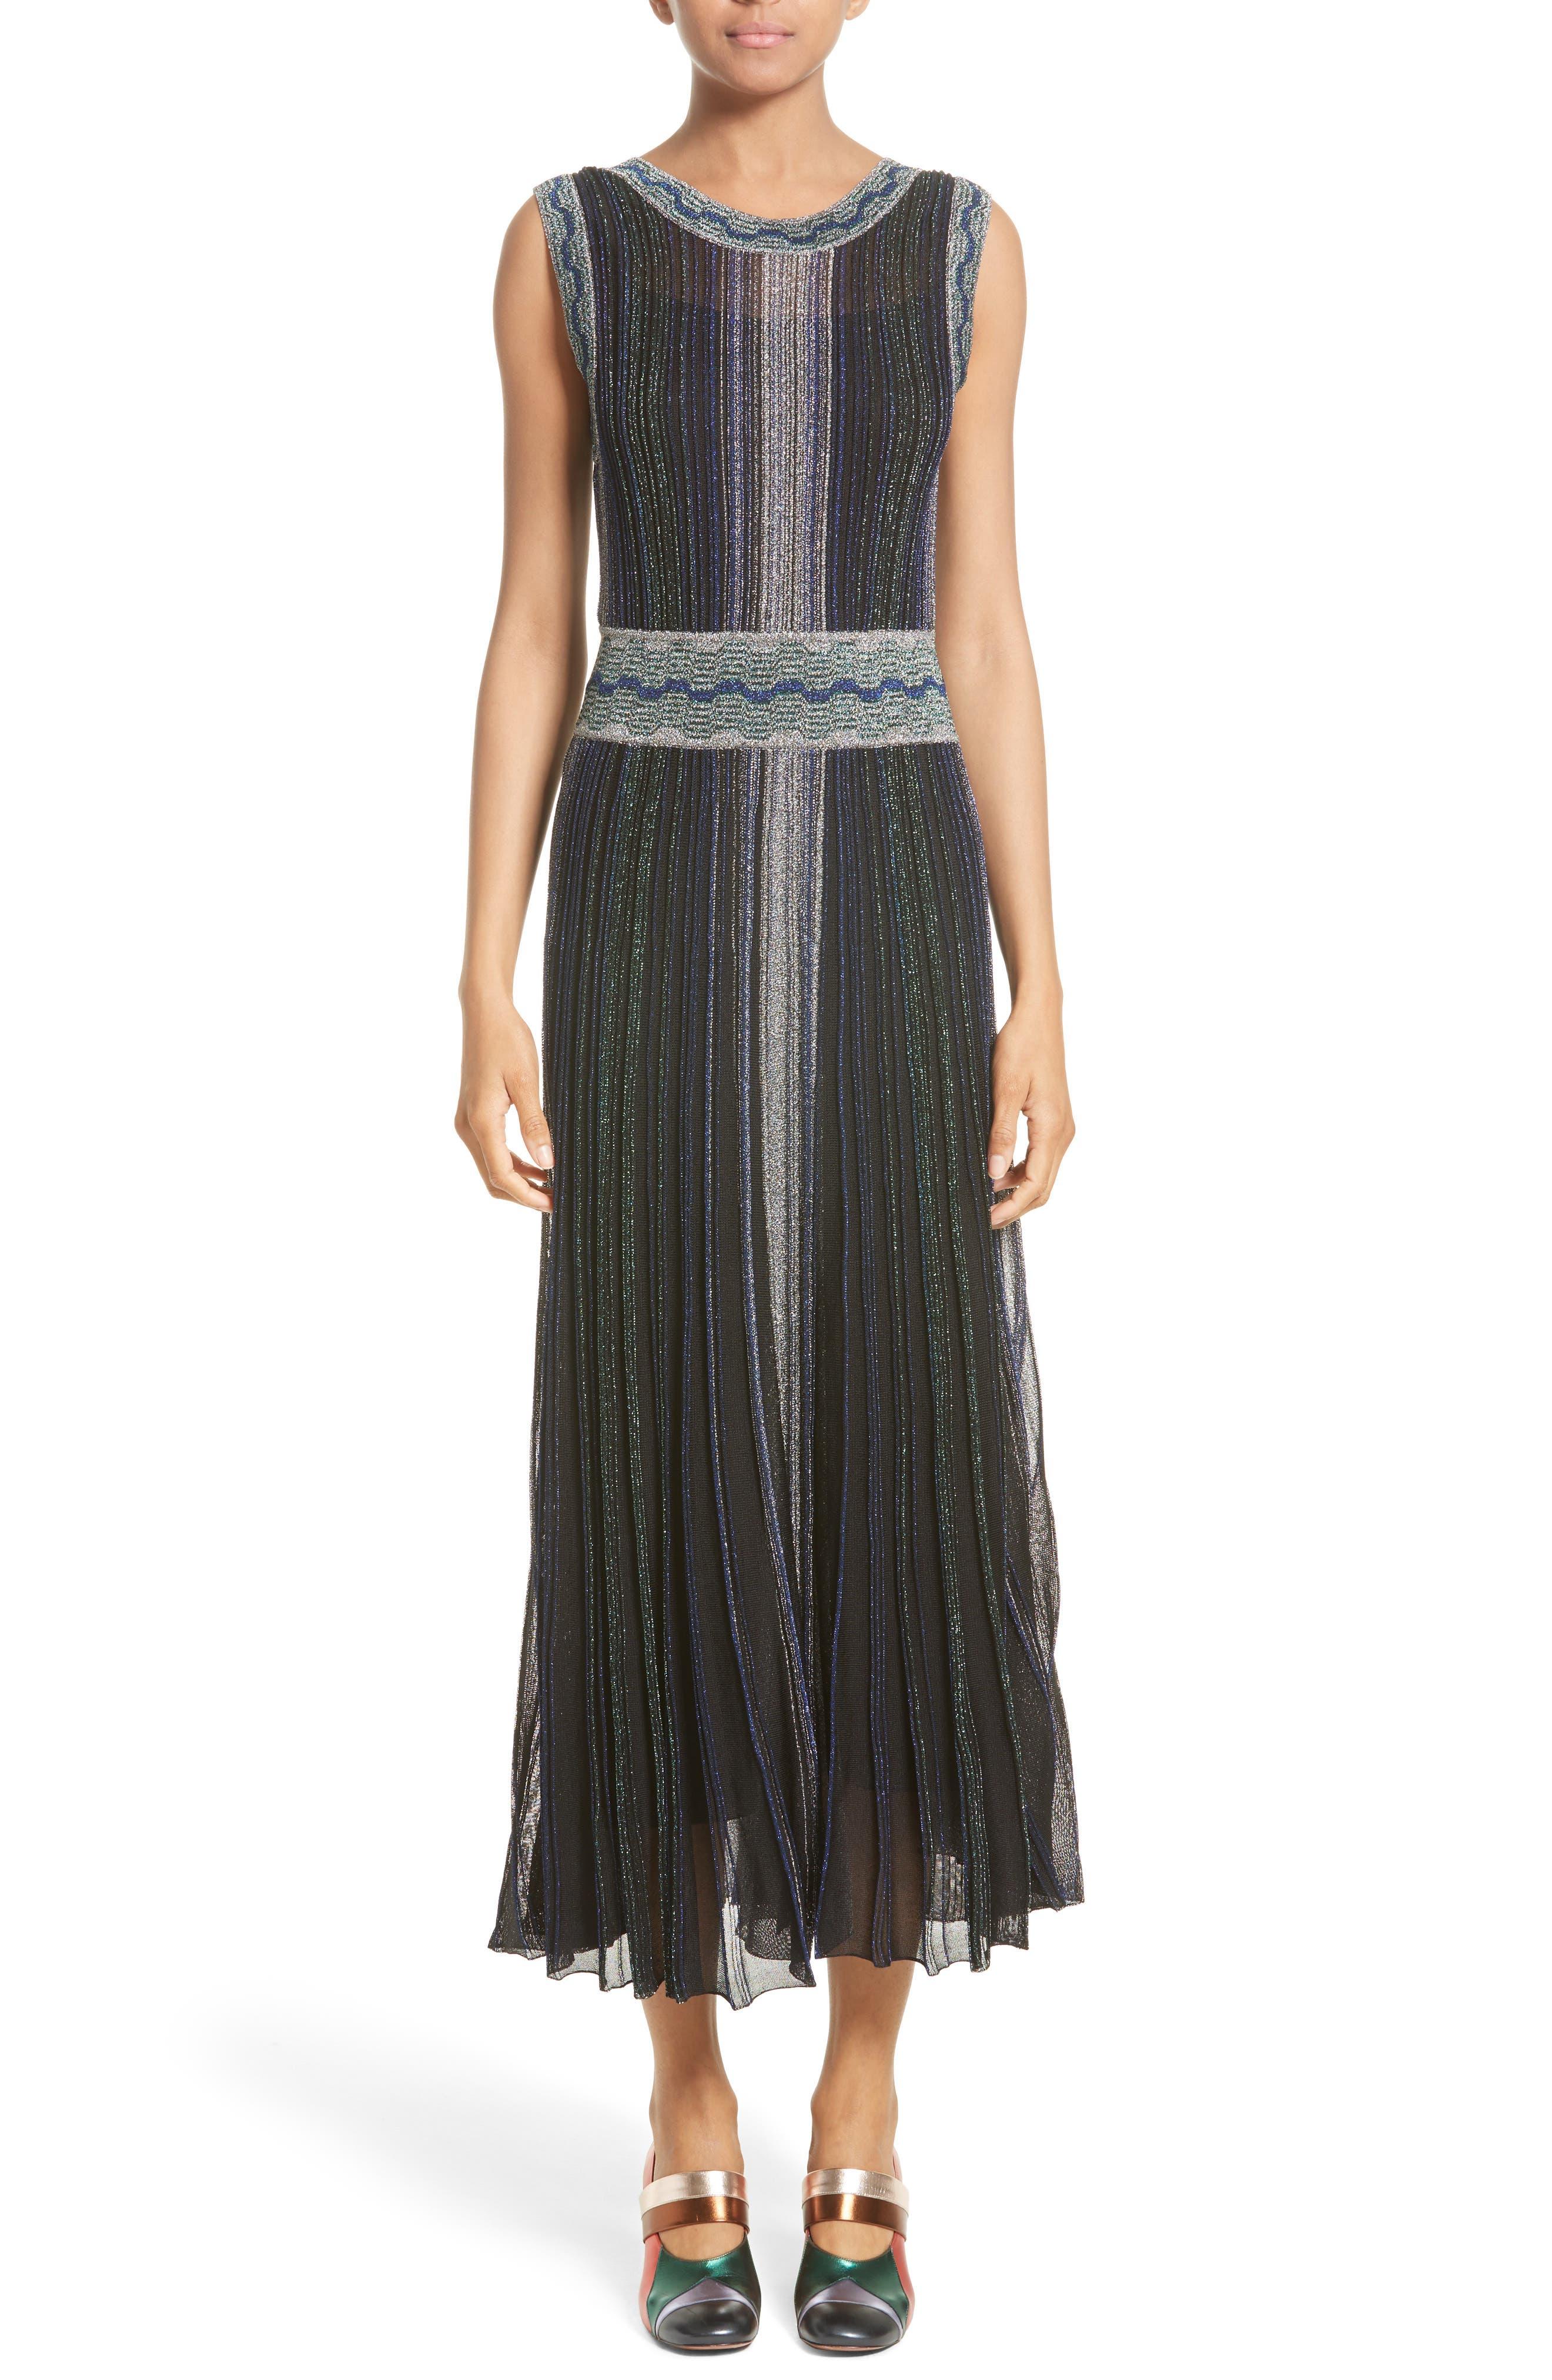 Main Image - Missoni Reversible Metallic Rib Knit Dress